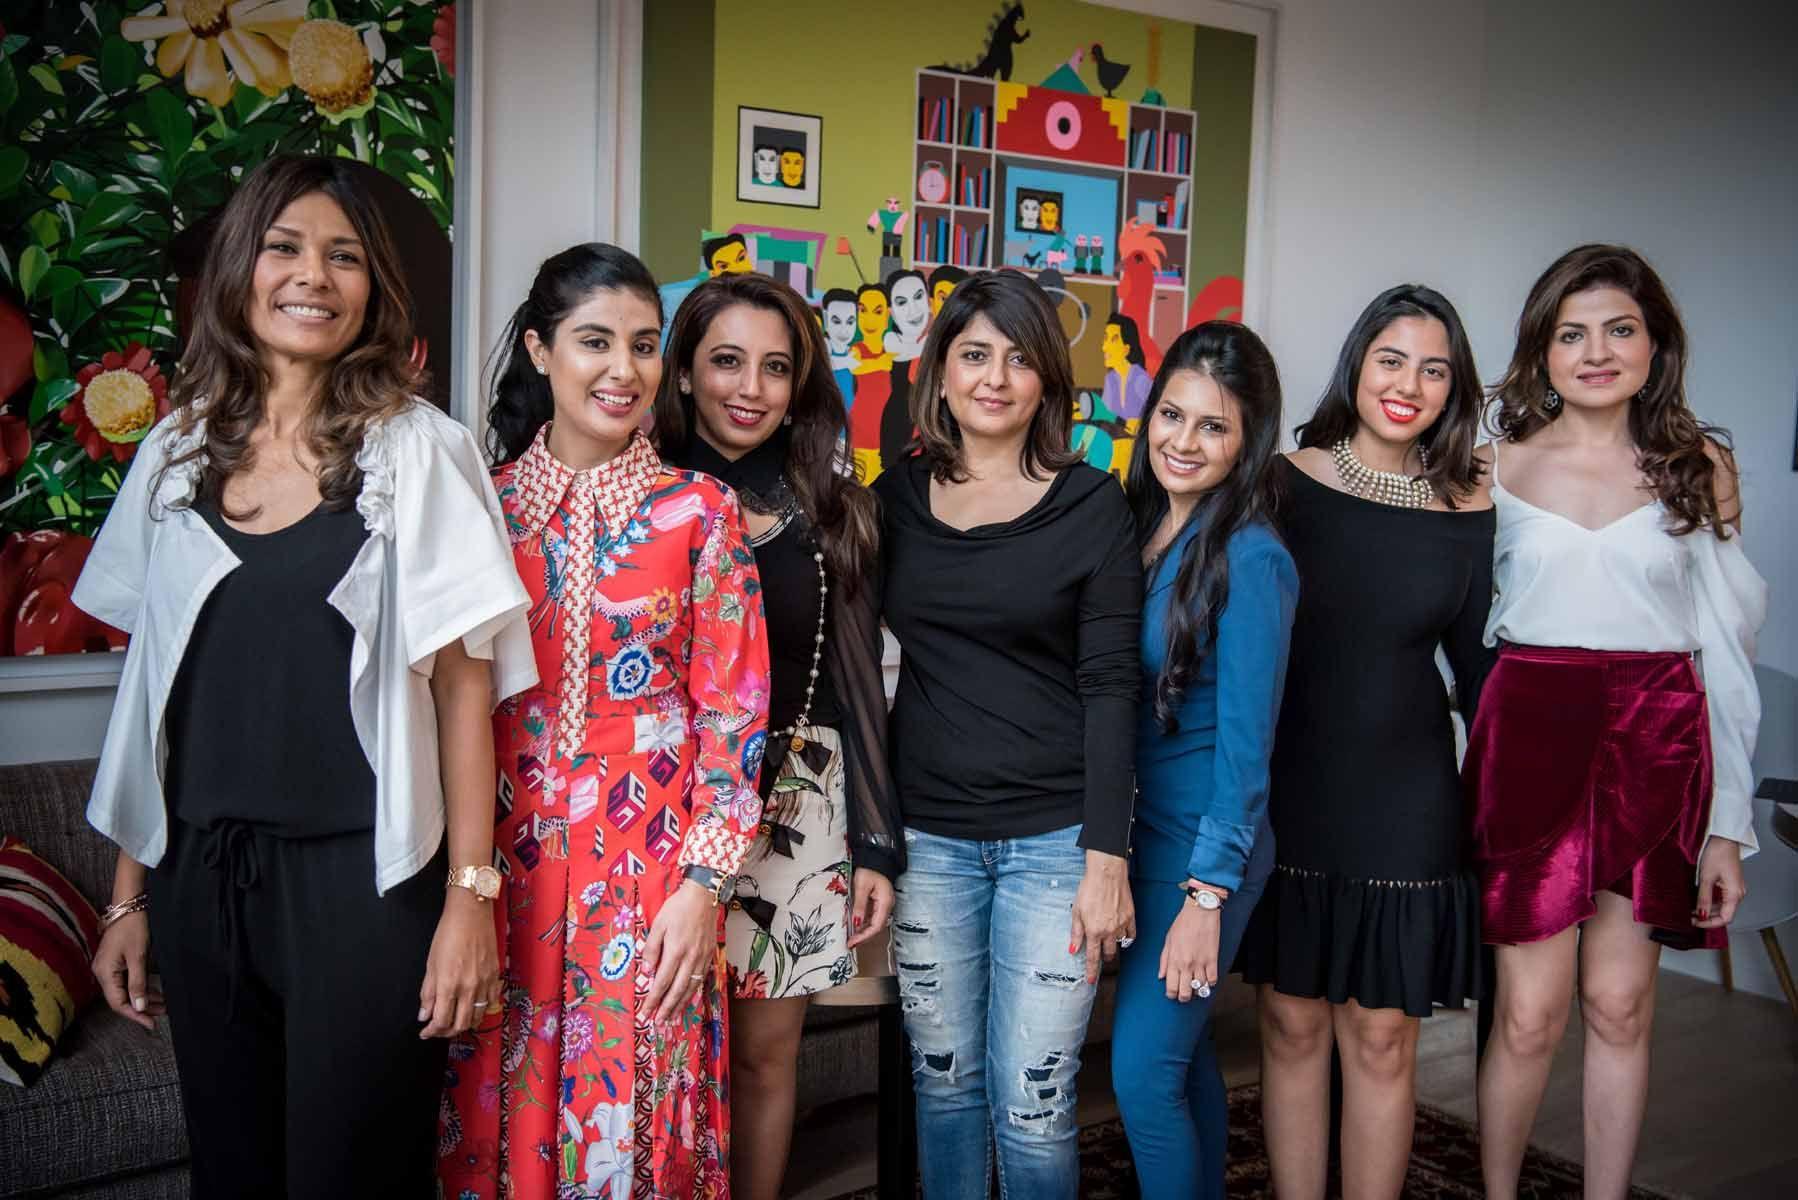 Chin Bottinelli, Nayantara Dhillon, Dimple Aswani, Bina Rampuria, Prerna Jhunjhunwala, Shaila Hiranandani, Roshan Valiram